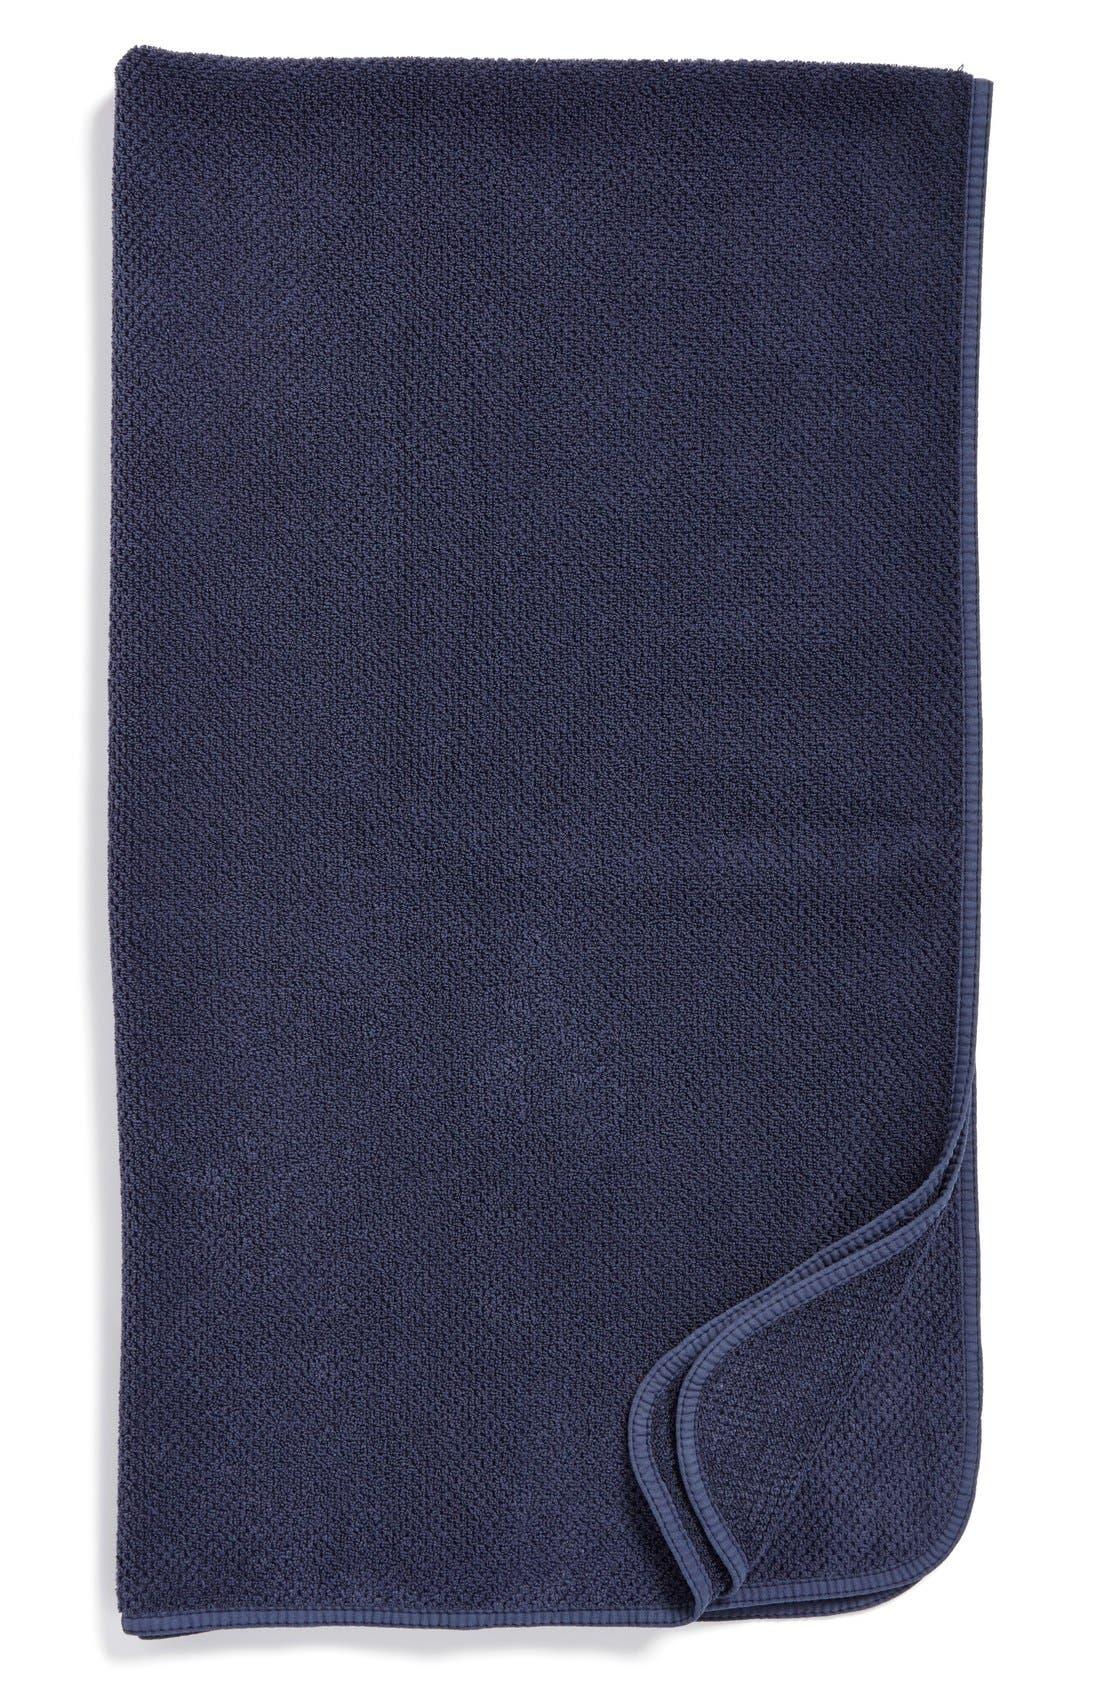 KASSATEX 'Abeille' Egyptian Cotton Bath Towel